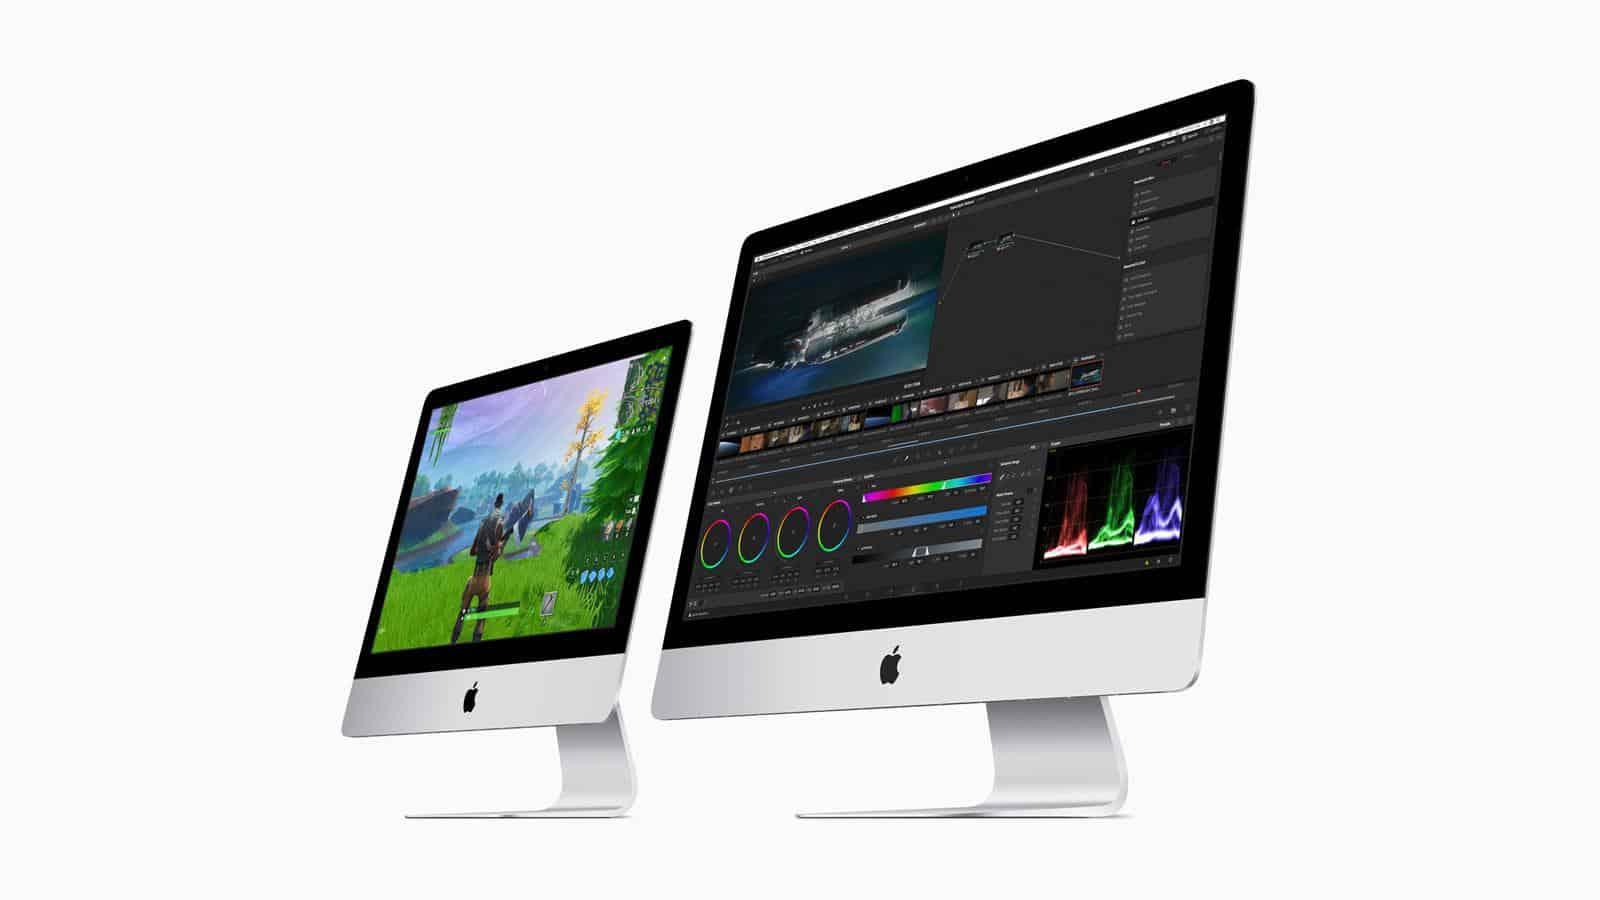 iMac de 27 Arm